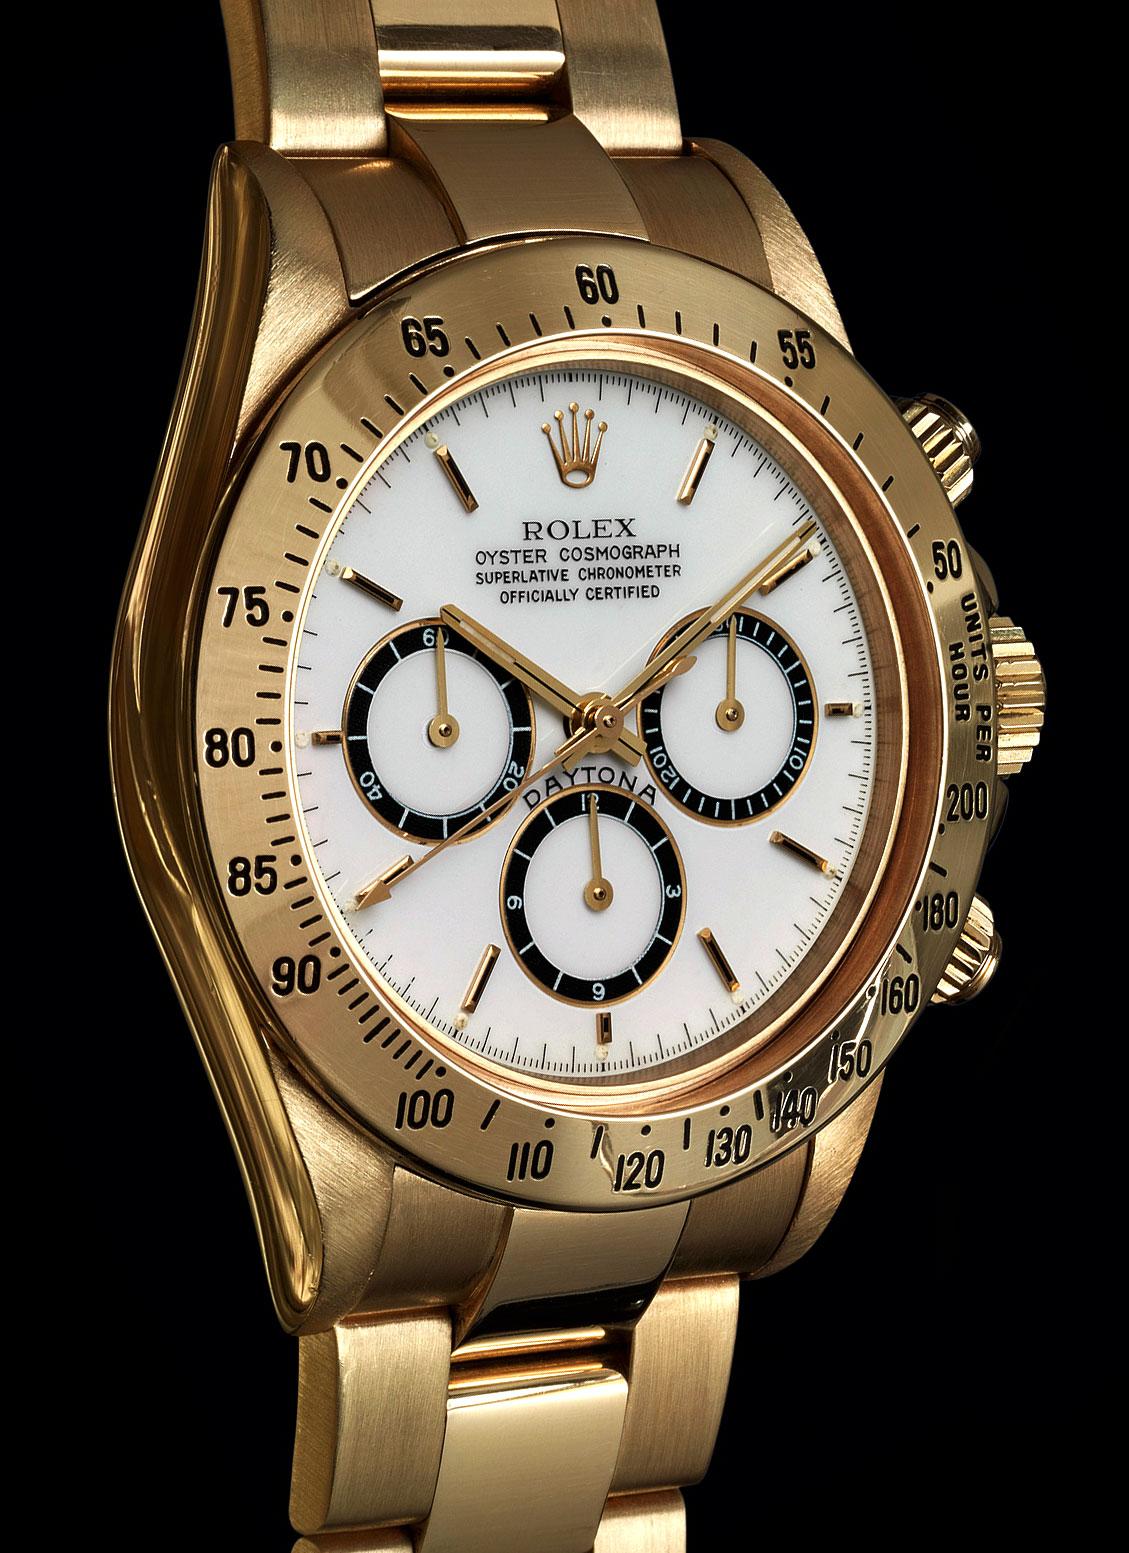 Diamond Wallpaper Hd Rolex Watch